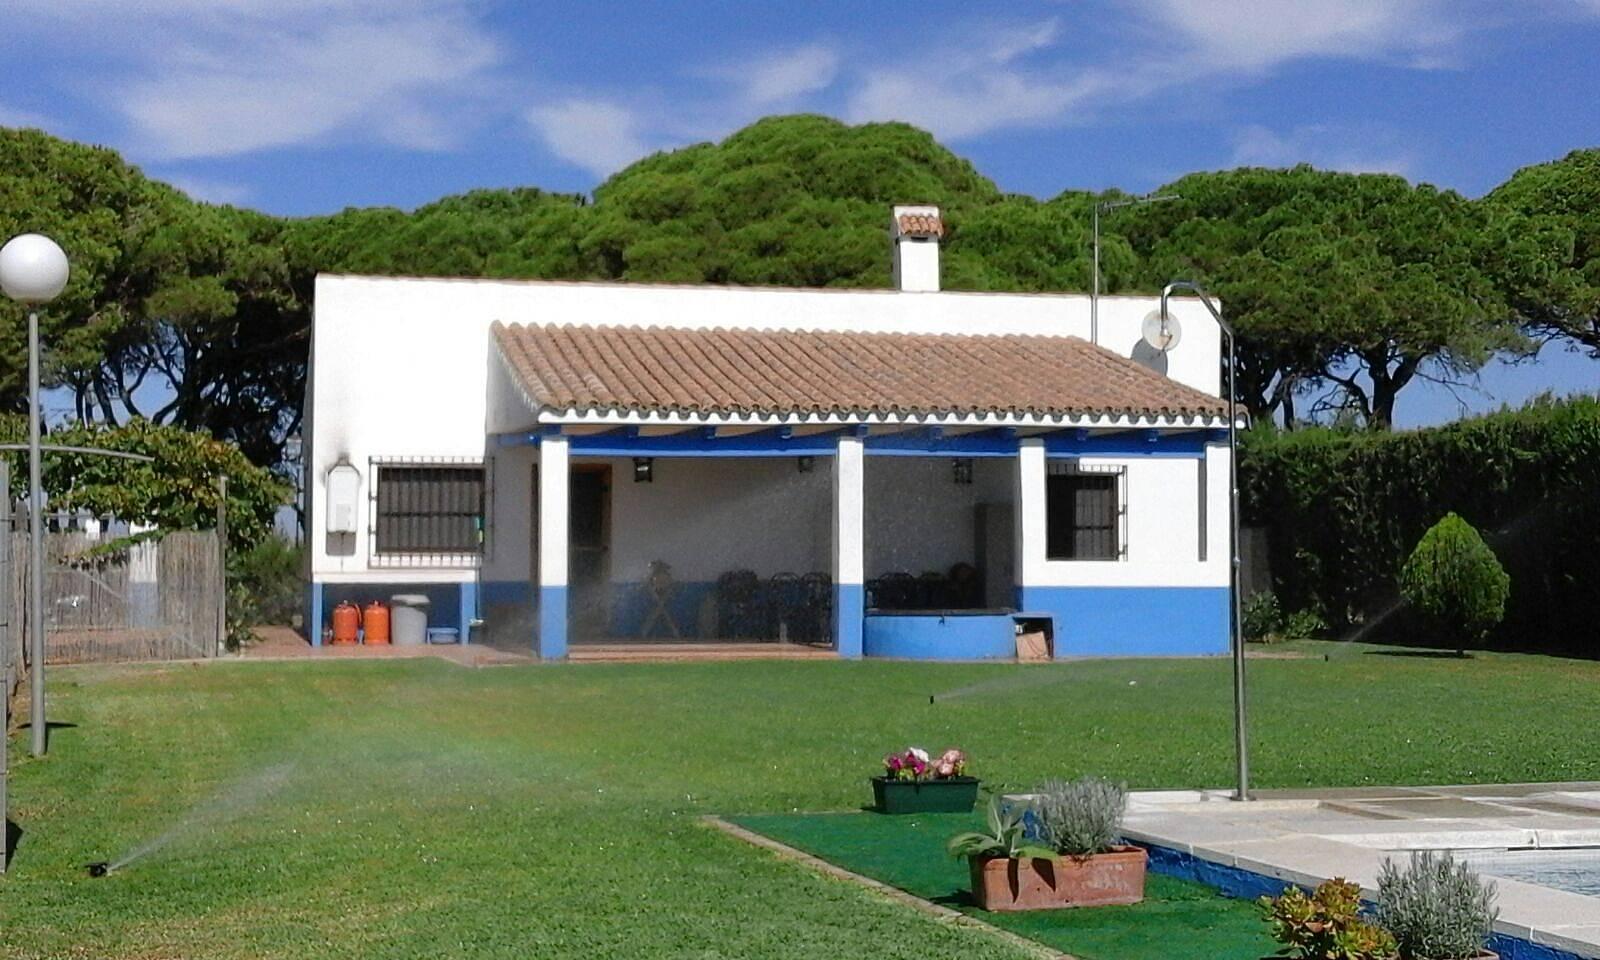 Casa en alquiler a 3 km de la playa chipiona c diz - Casa vacaciones cadiz ...